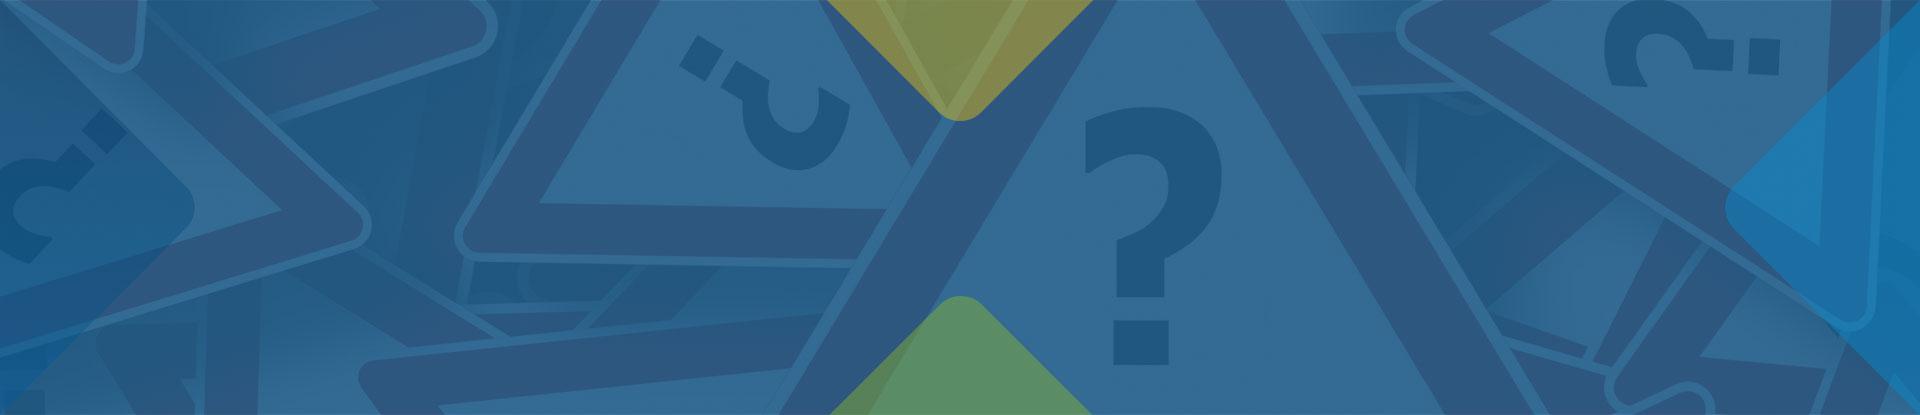 SynX Banner Fleet Management Software  FAQ Page